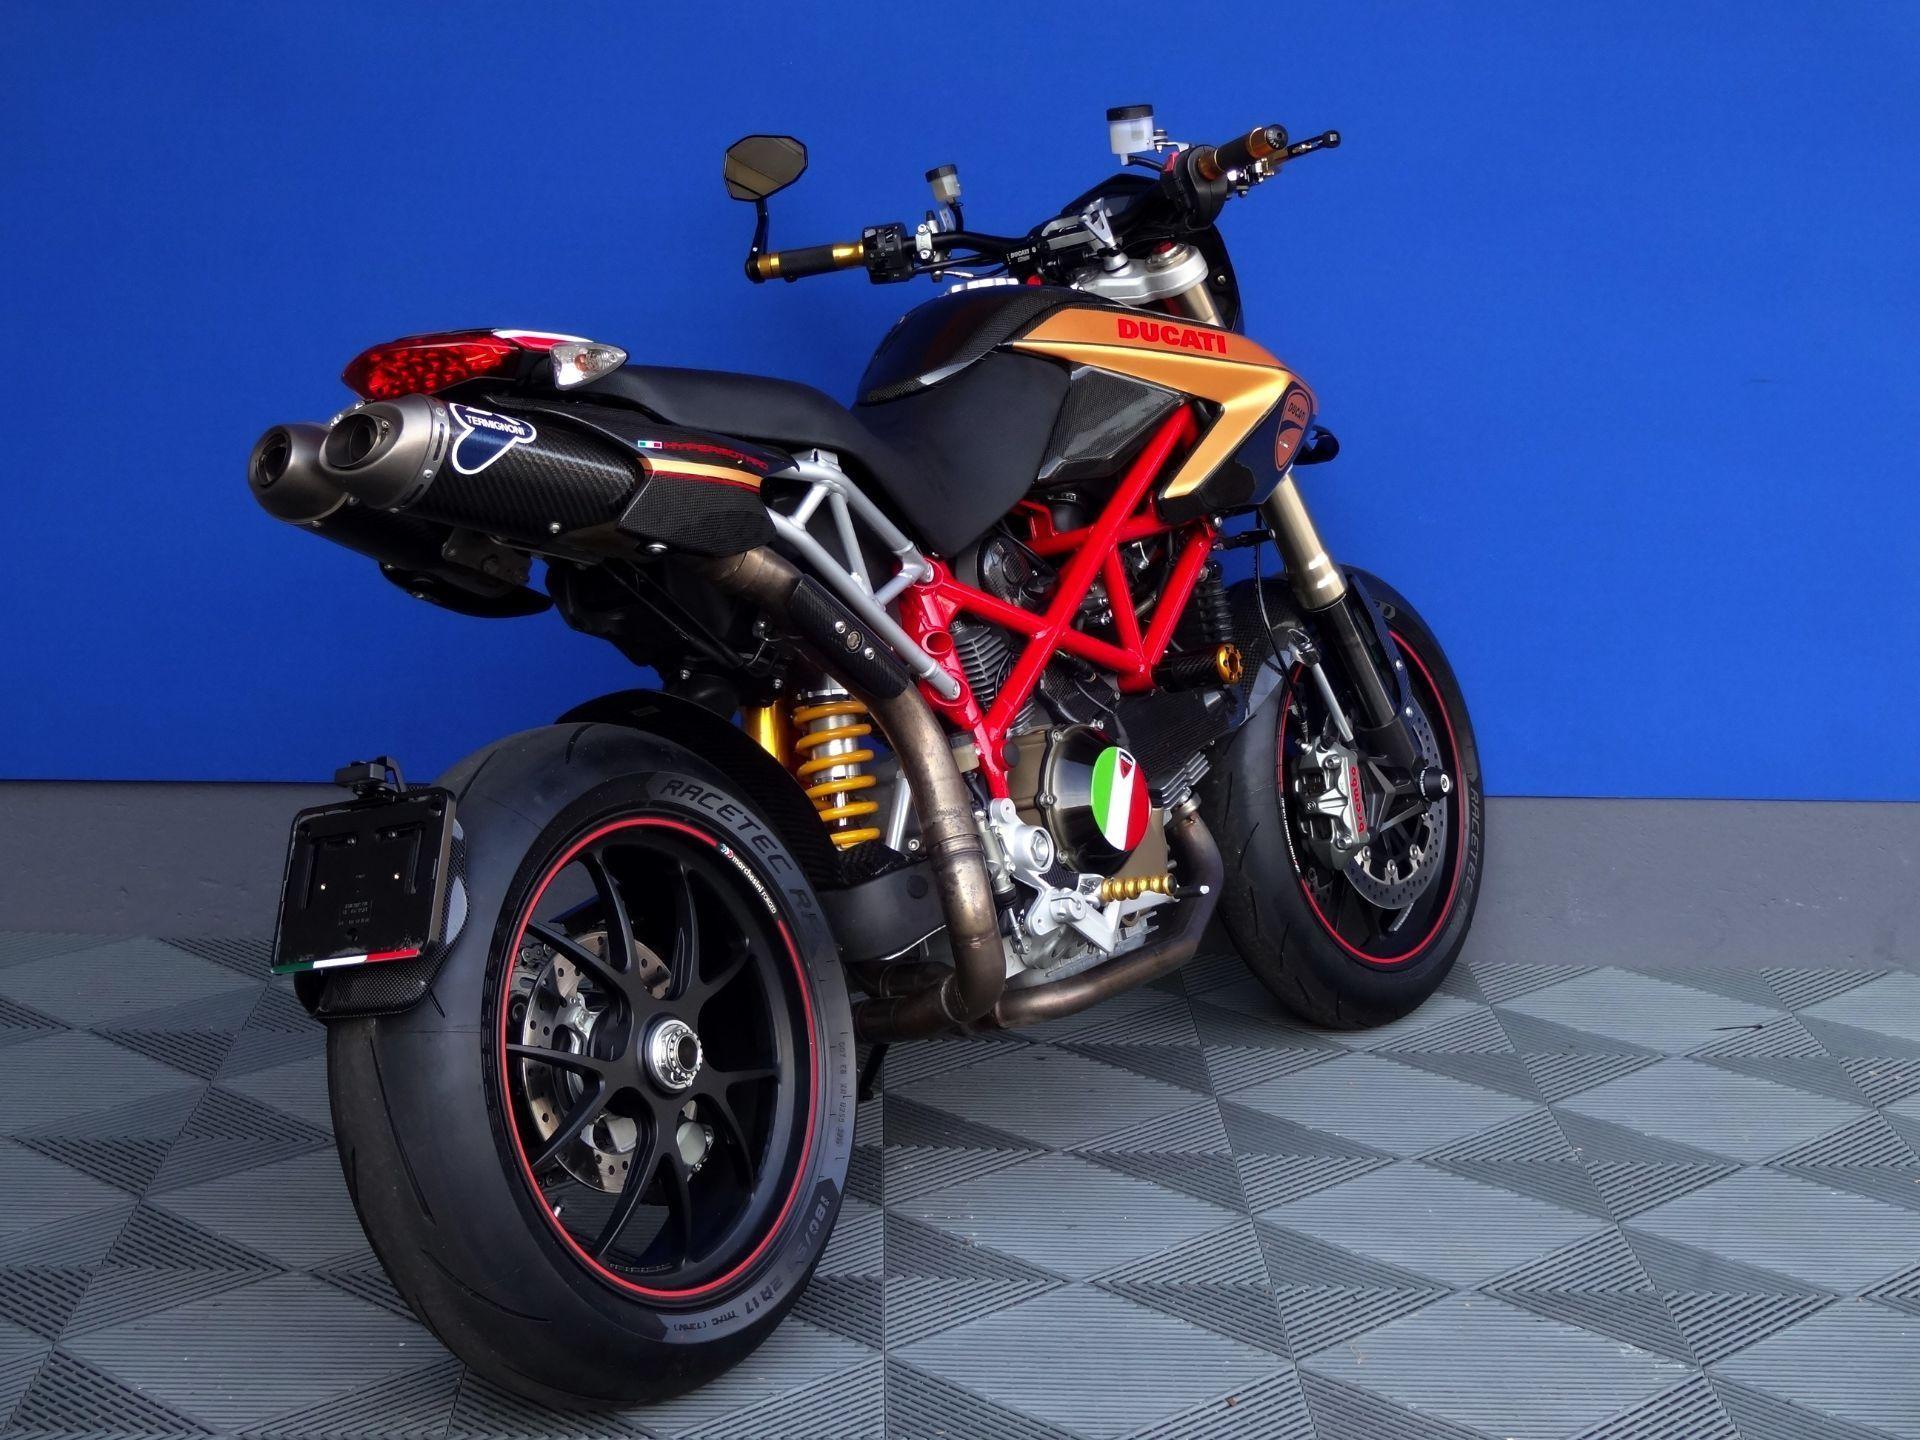 ducati 1100 hypermotard s termignoni vogel motorbikes sch pfheim occasion. Black Bedroom Furniture Sets. Home Design Ideas